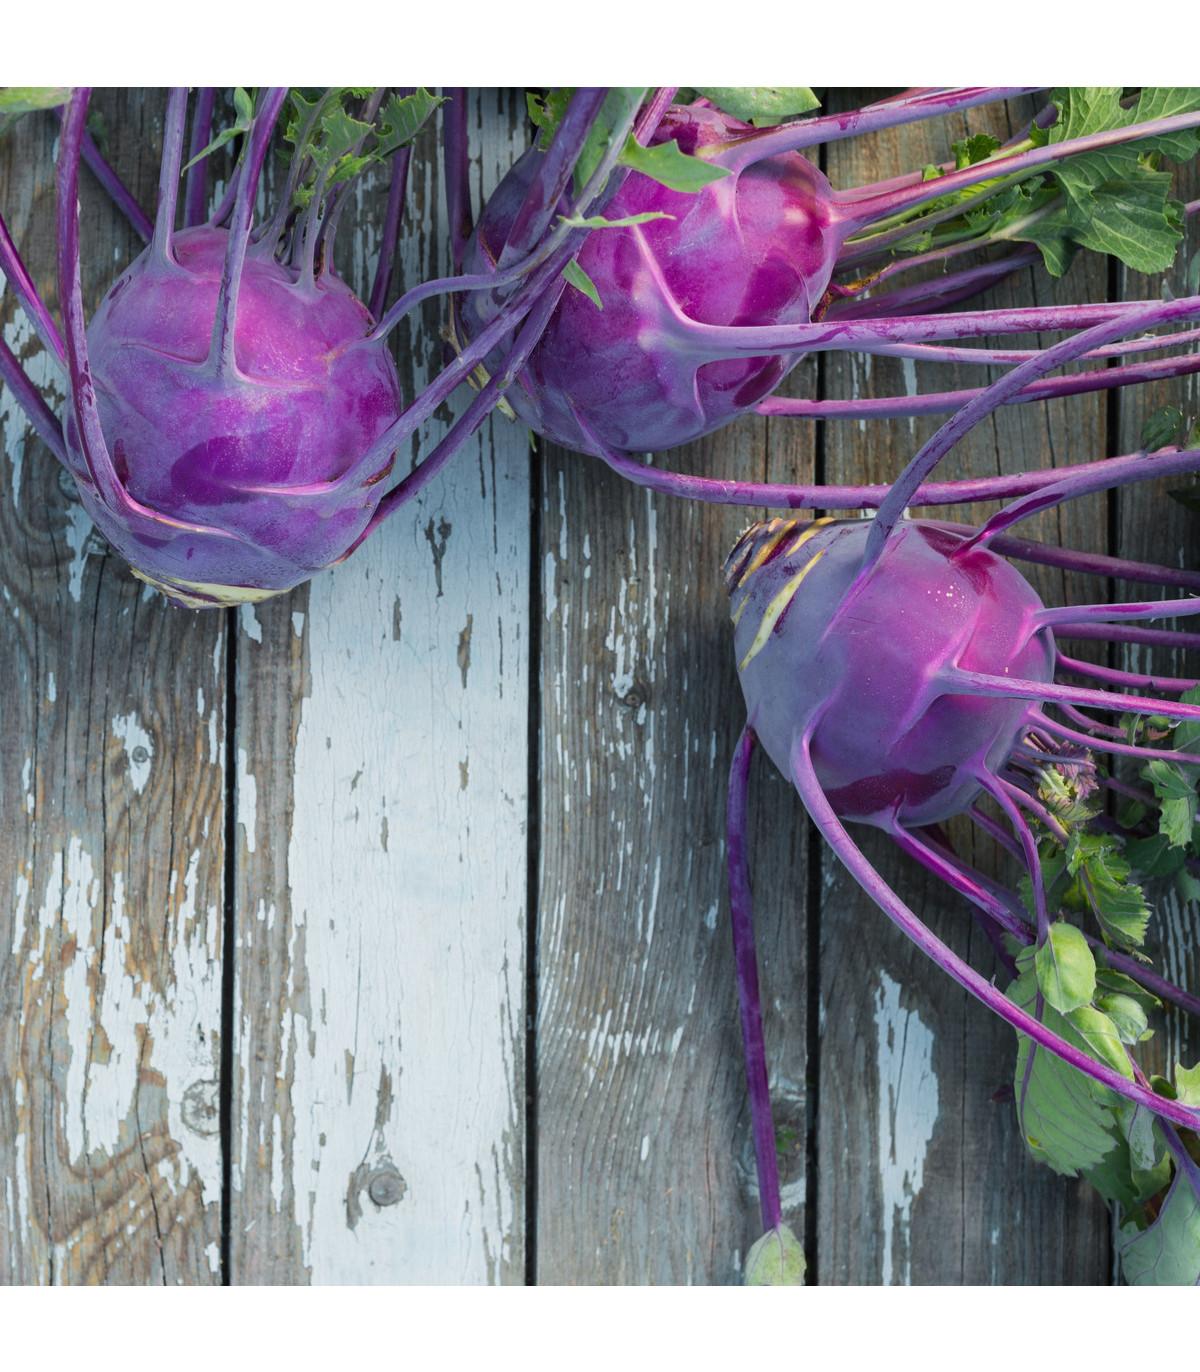 Kaleráb skorý modrý Purple vienna - Brassica oleracea - semená - 0,3 g